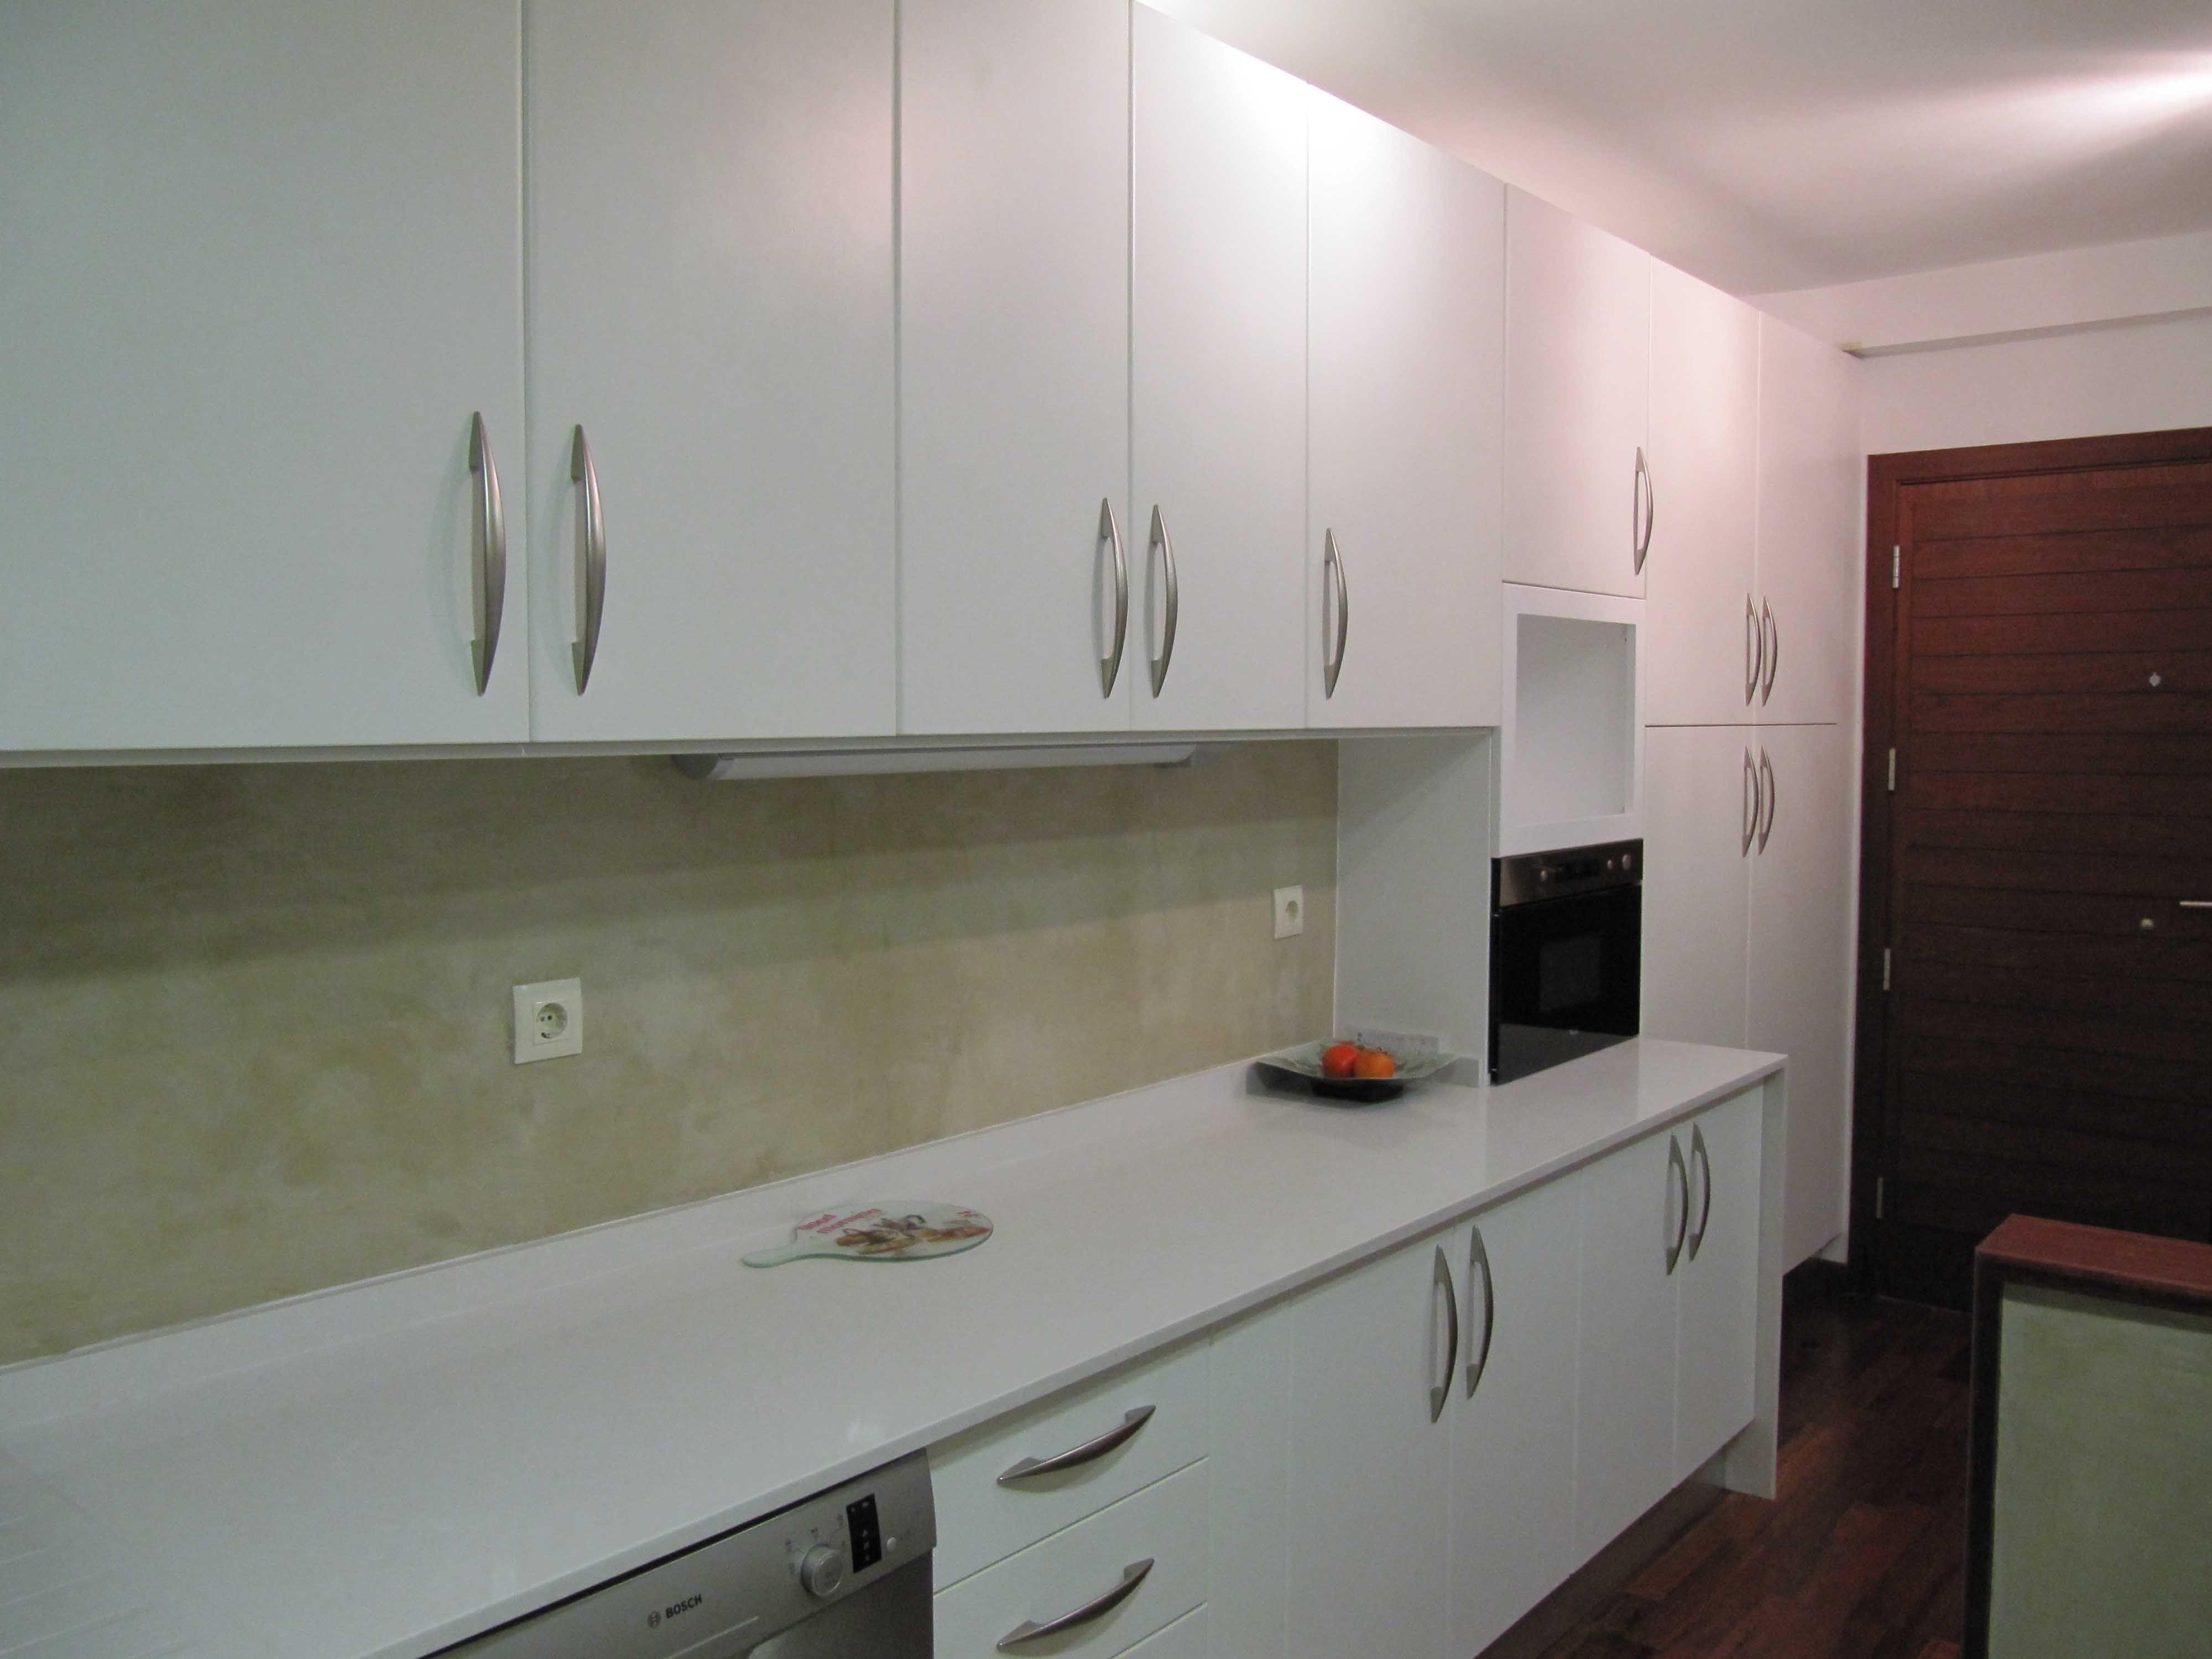 La pared de tu cocina con microcemento para darle un aire original cocinas pinterest - Paredes de microcemento ...